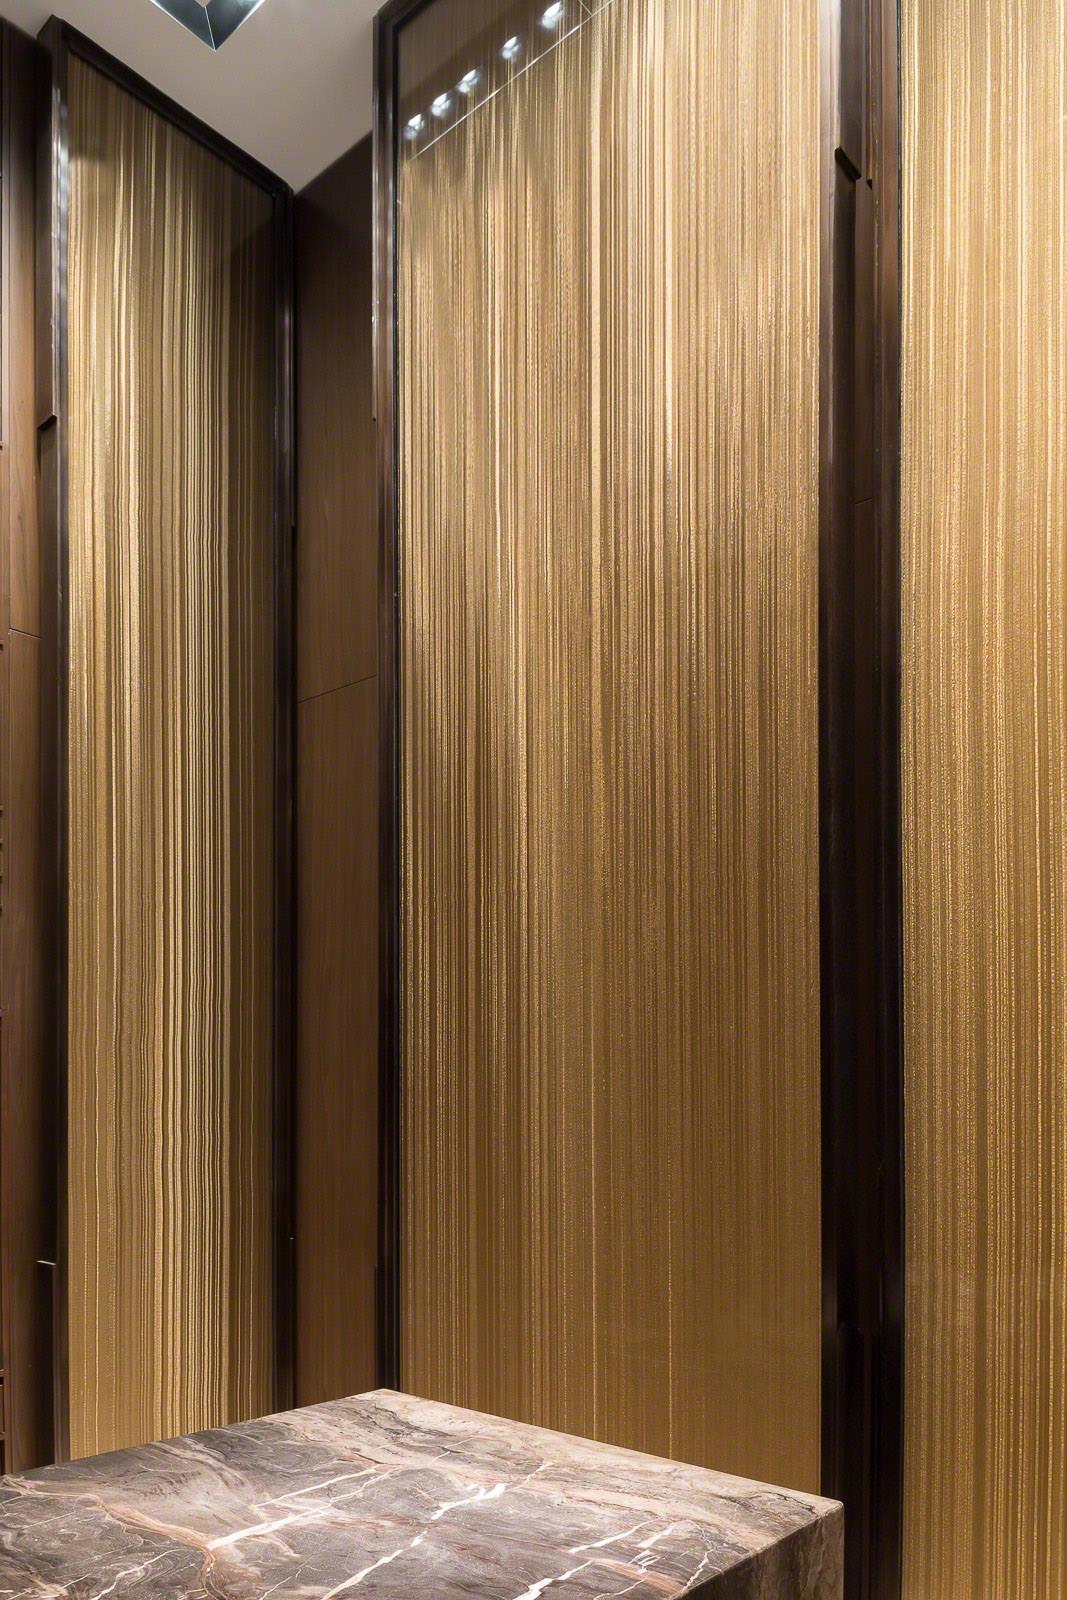 Four-Seasons-Downtown-New-York-USA-Woven-Metal-Glass-Lamination-Sophie-Mallebranche-Paris